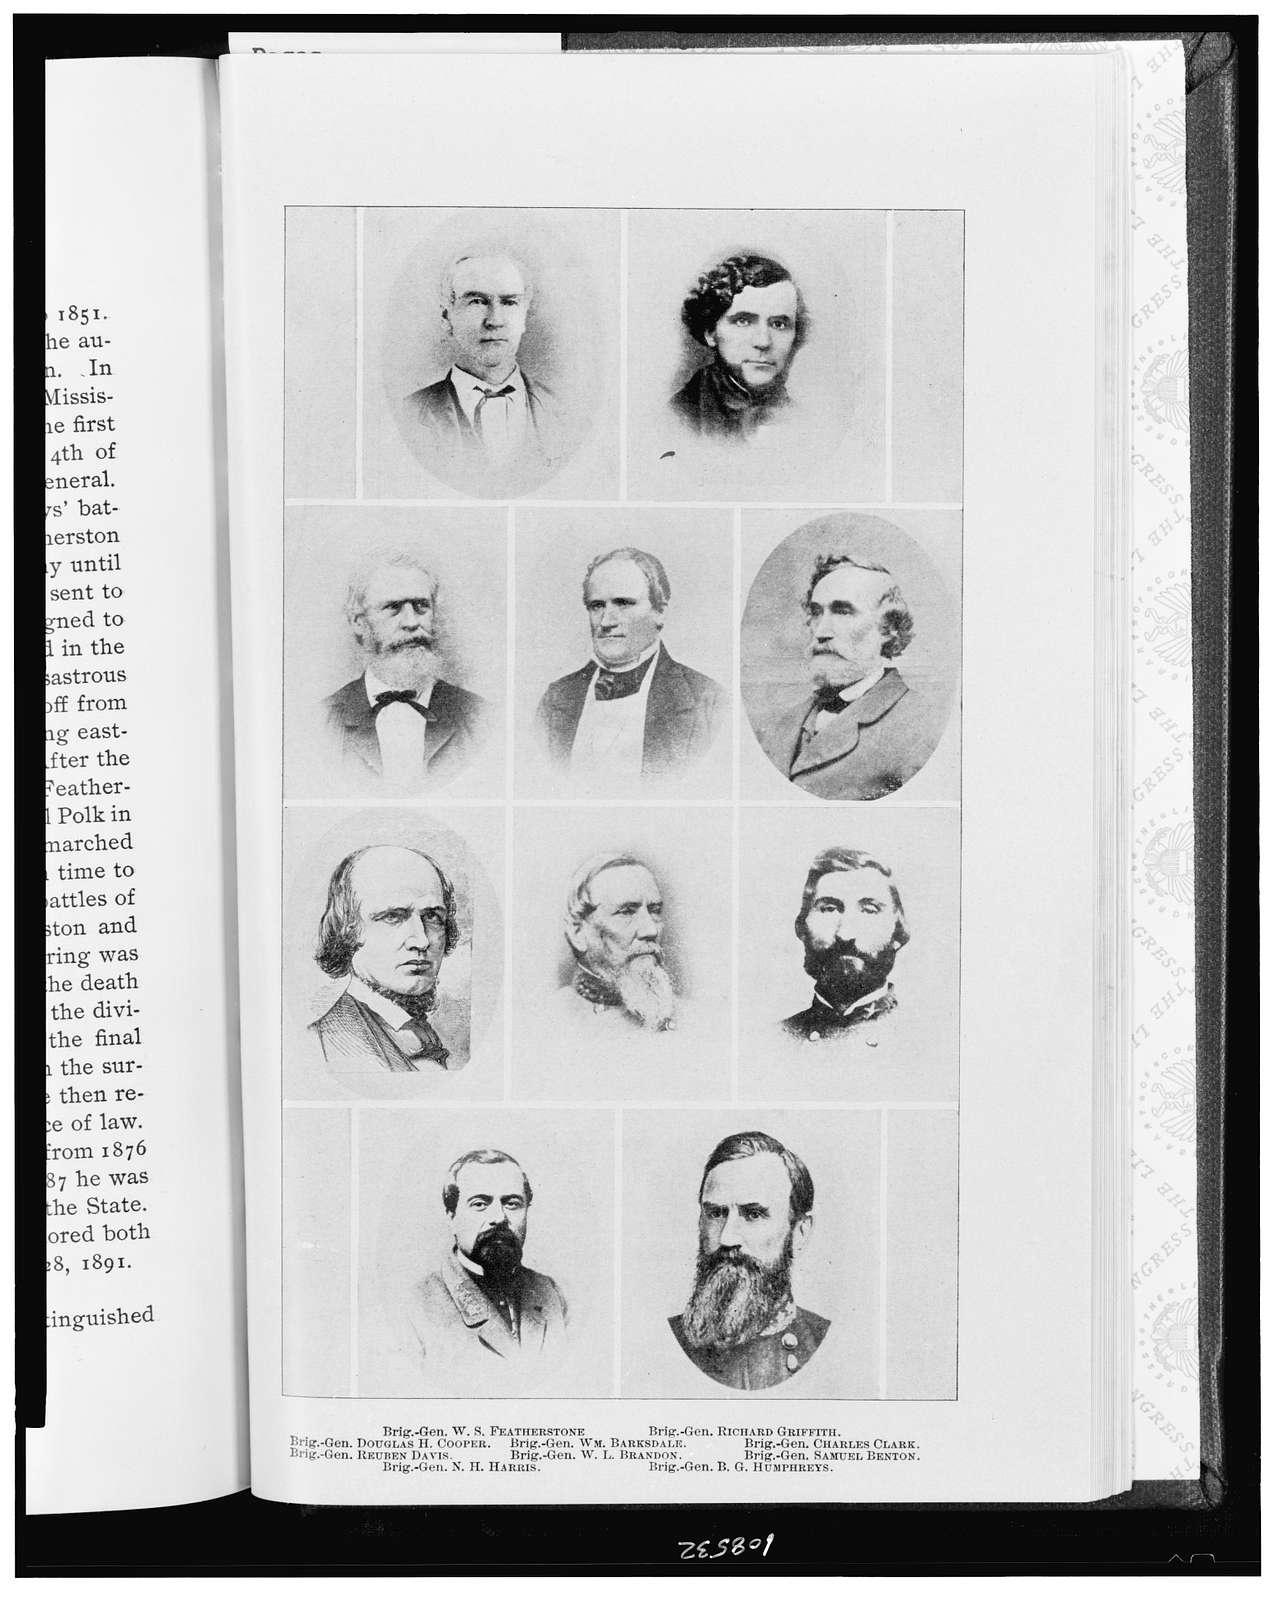 Brig.-Gen. W.S. Featherstone; Brig.-Gen. Richard Griffith; Brig.-Gen. Douglas H. Cooper; Brig.-Gen. Wm. Barksdale; Brig.-Gen. Charles Clark; Brig.-Gen. Reuben Davis; Brig.-Gen. W.L. Brandon; Brig.-Gen. Samuel Benton; Brig.-Gen. N.H. Harris; Brig.-Gen. B.G. Humphreys